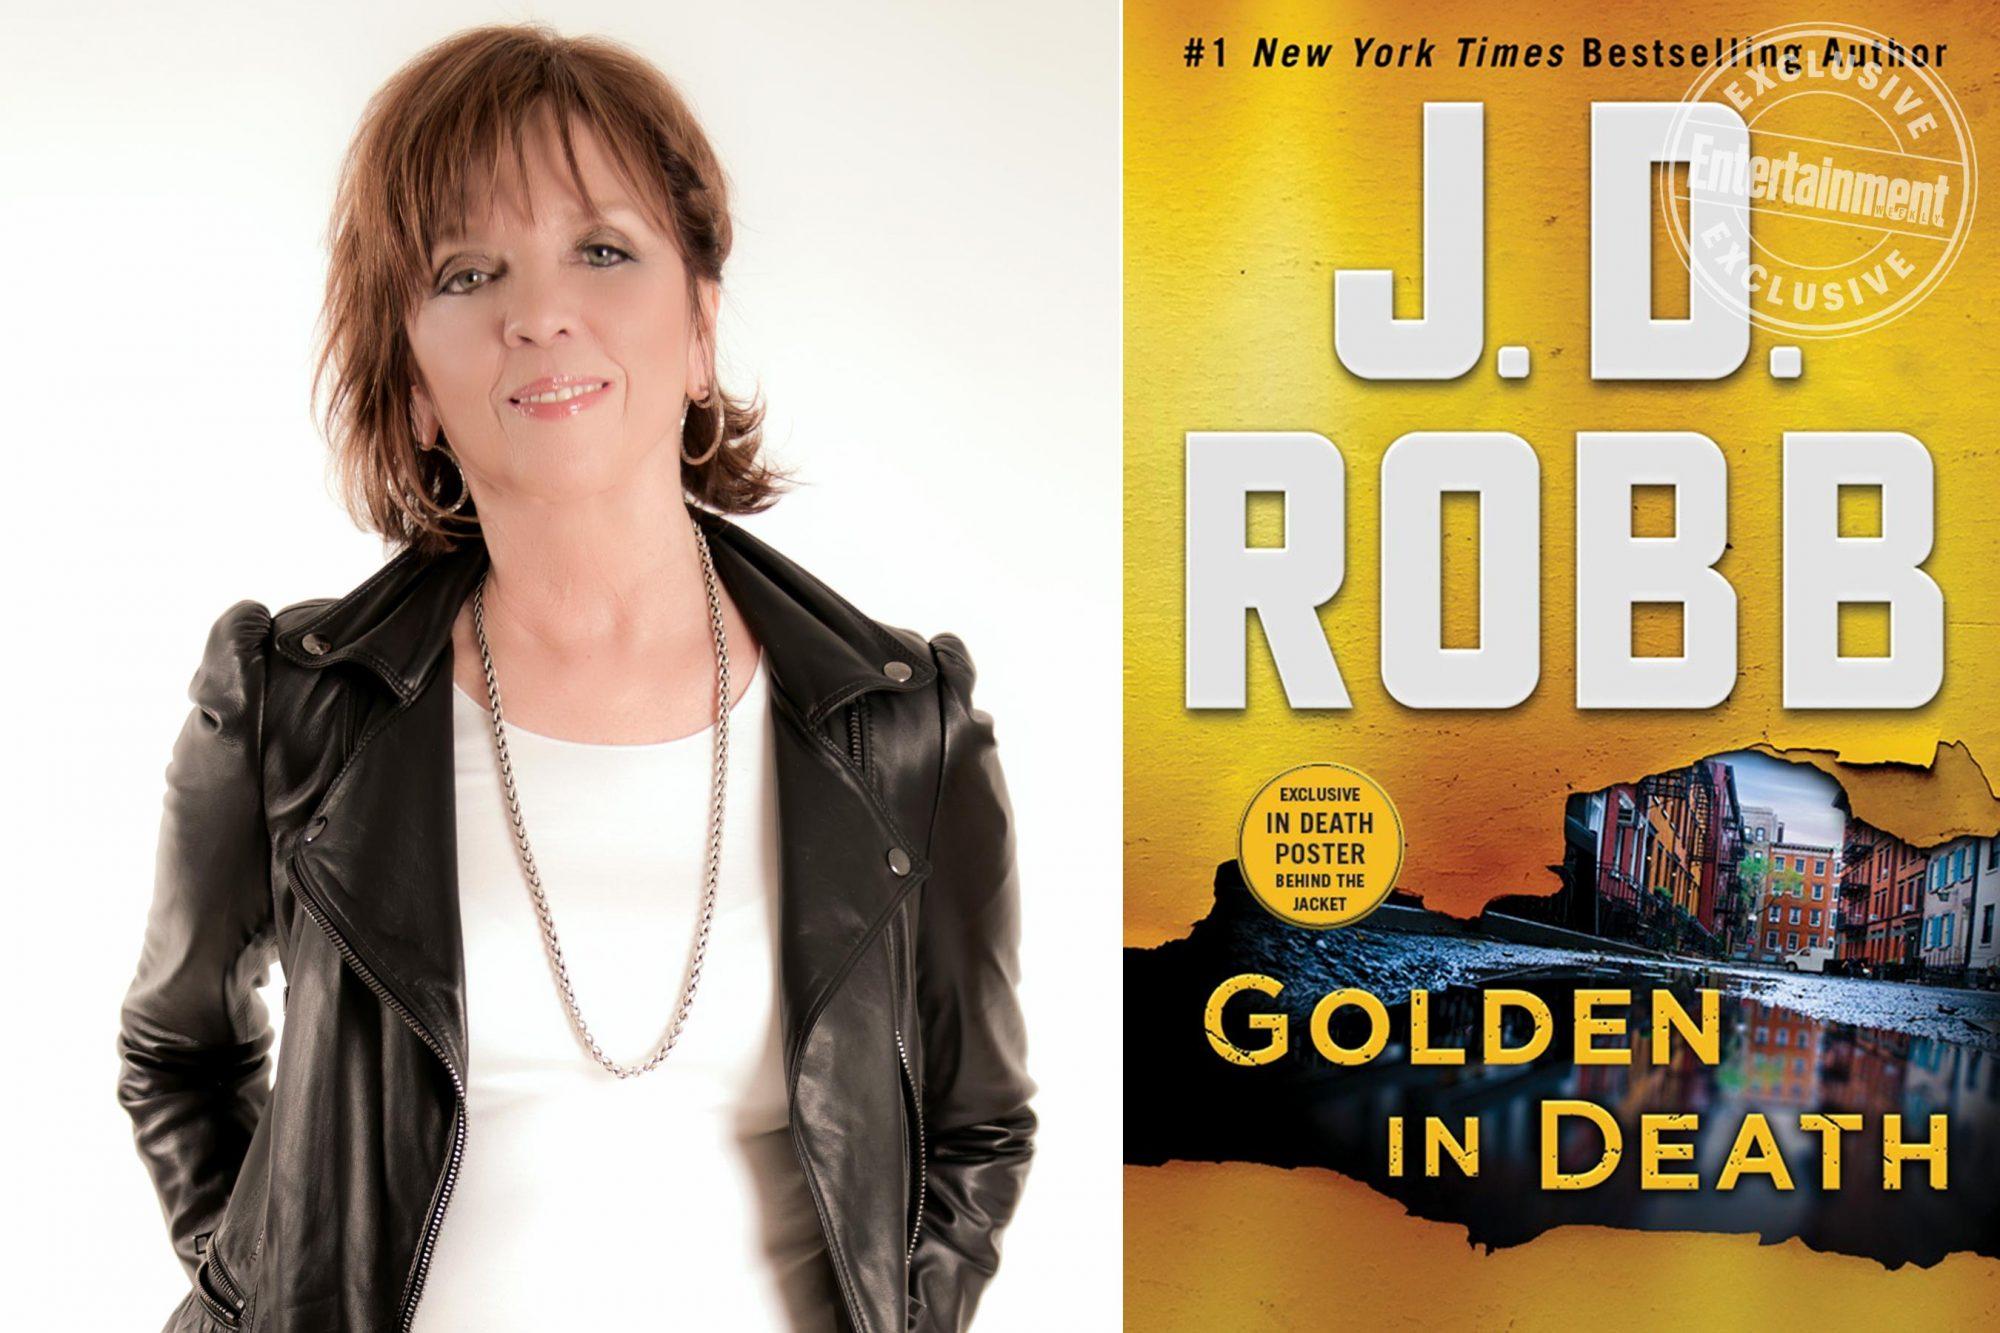 Nora Roberts aka JD Robb author photo CR: Bruce Wilder Golden In Death by J.D. Robb CR: St. Martin's Press